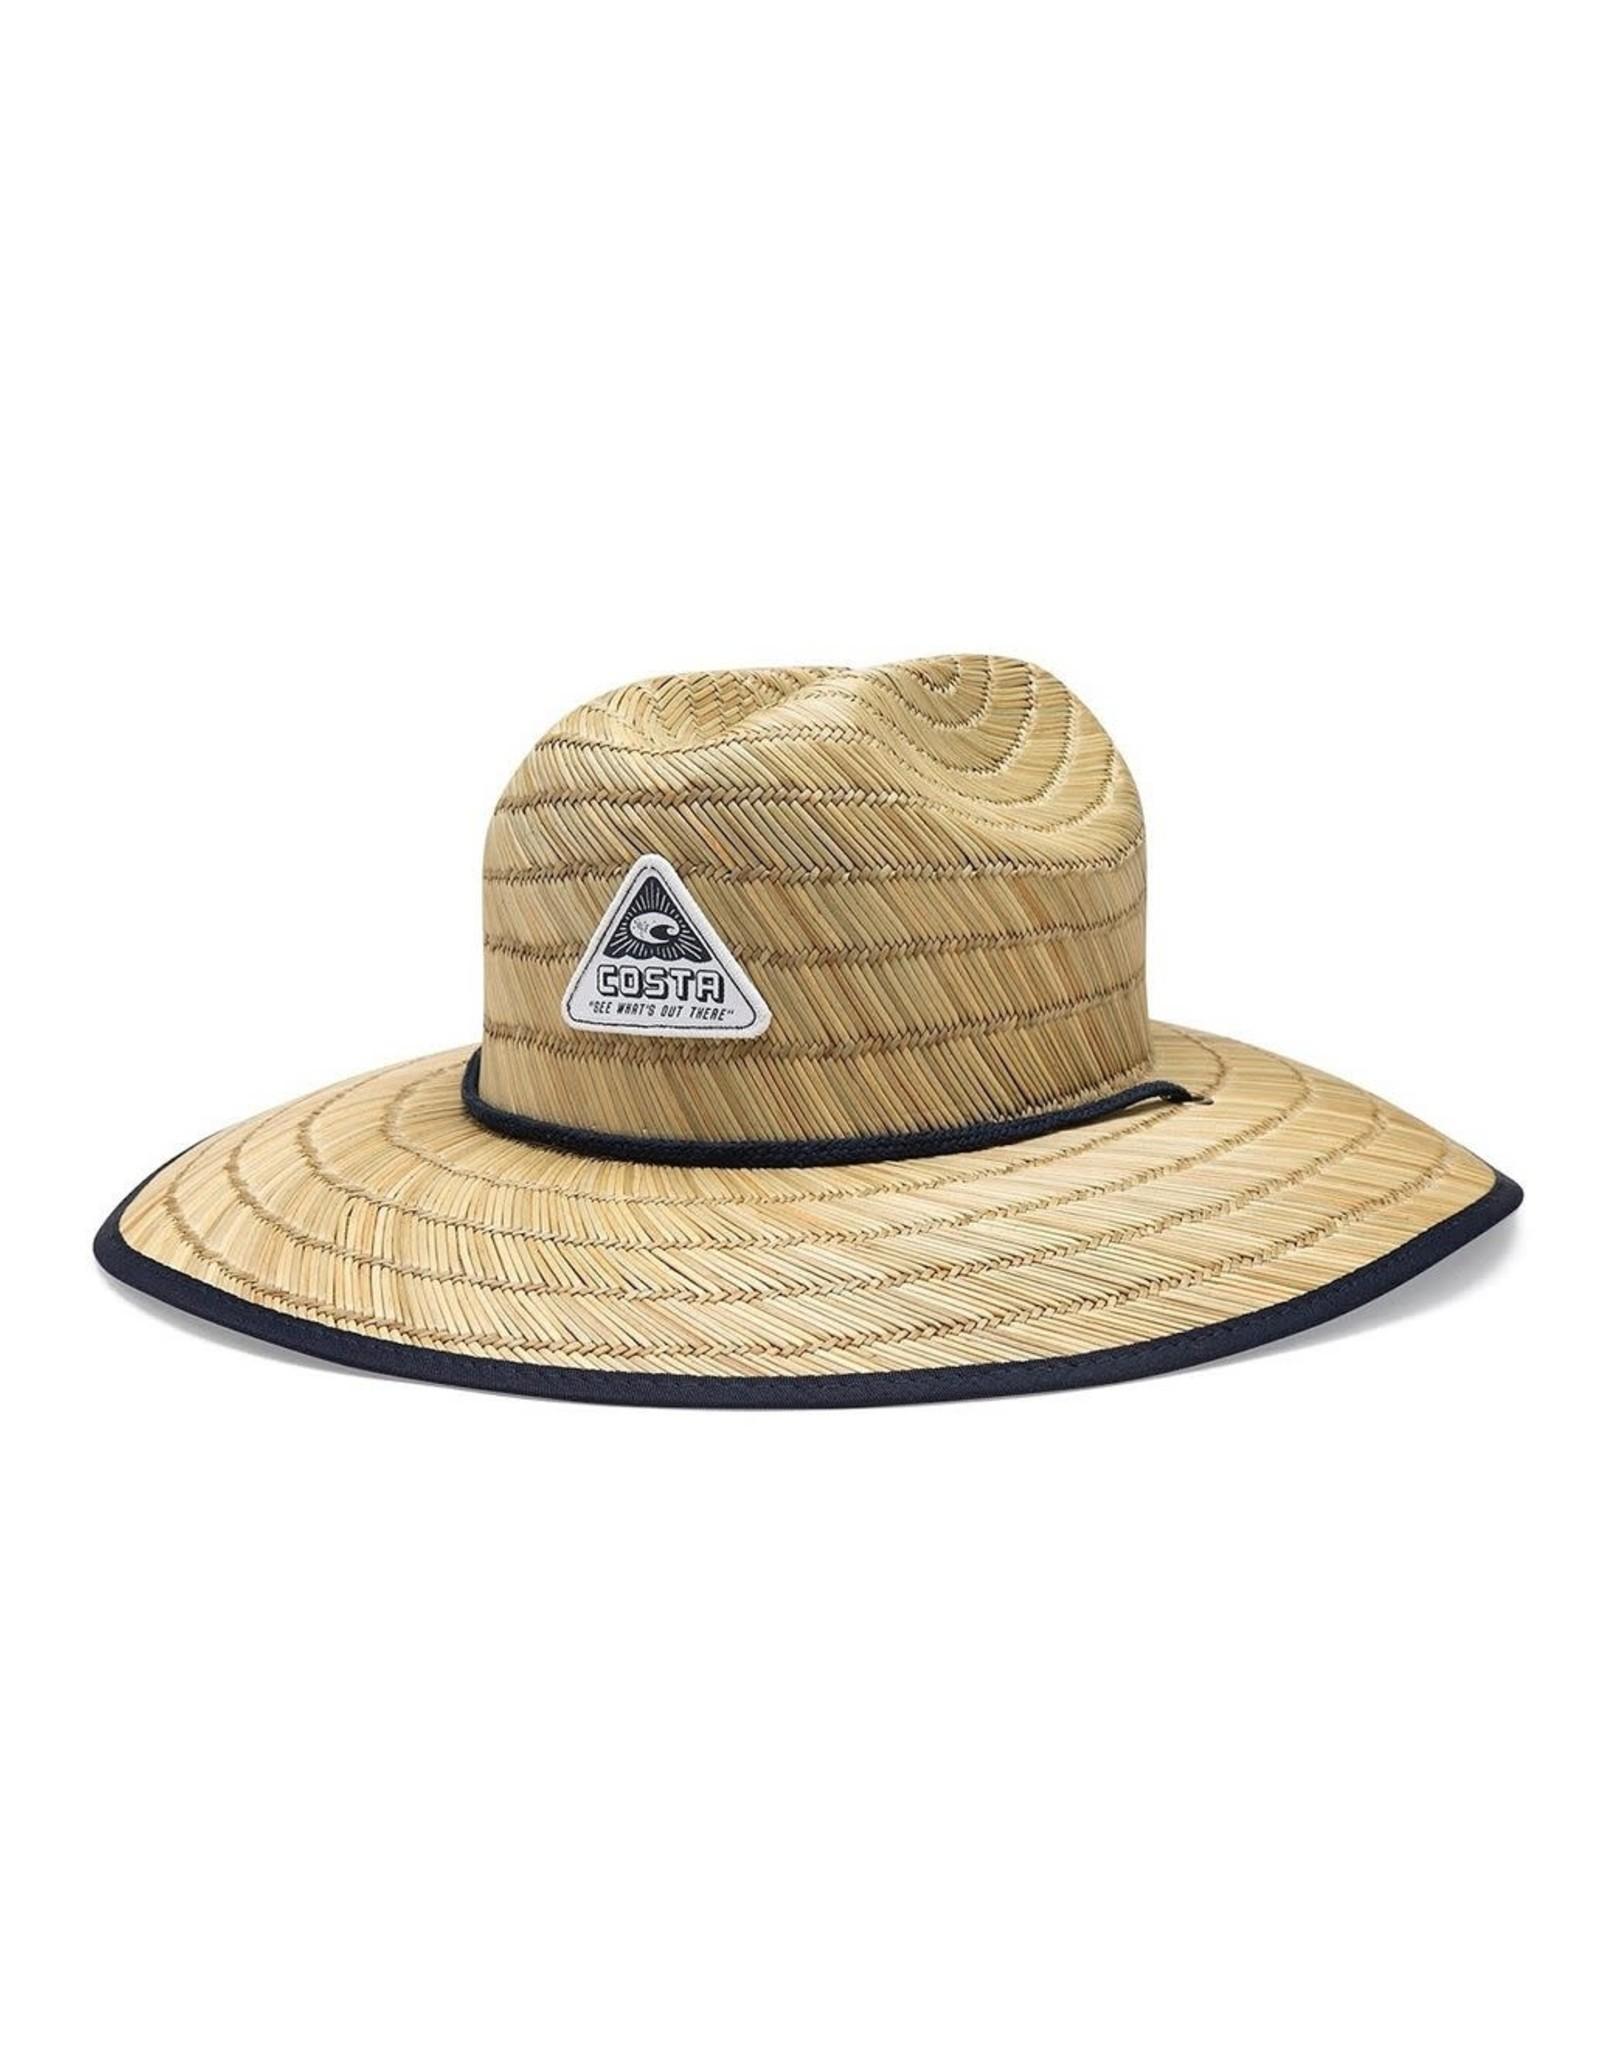 COSTA COSTA SWELLS STRAW LIFEGUARD HAT